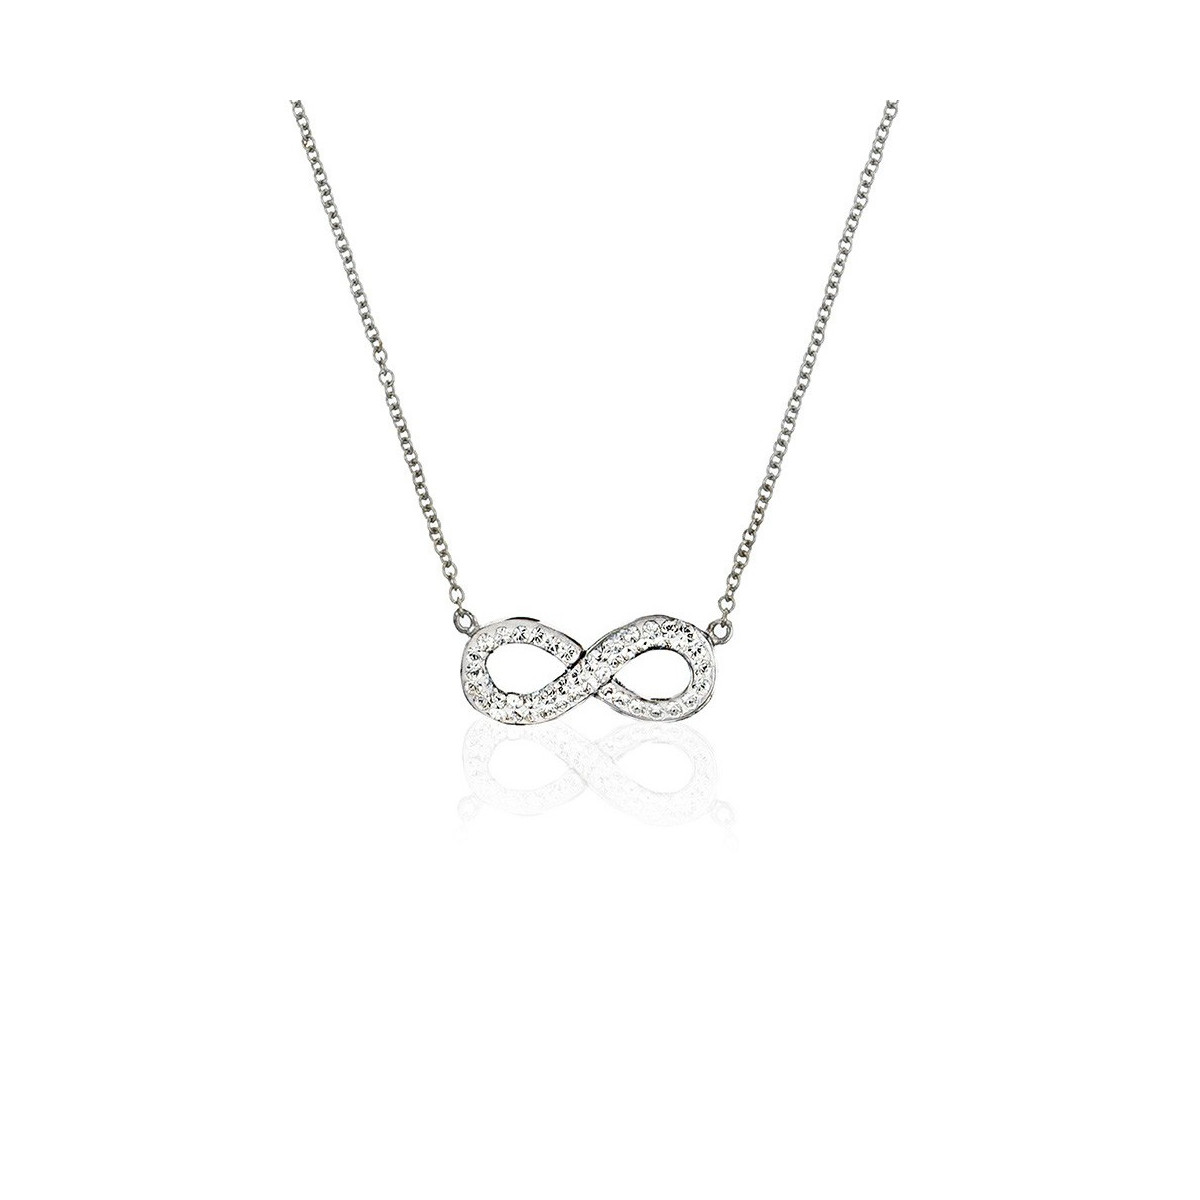 Collier Infinity Orné de Cristaux Swarovski | Mes-bijoux.fr